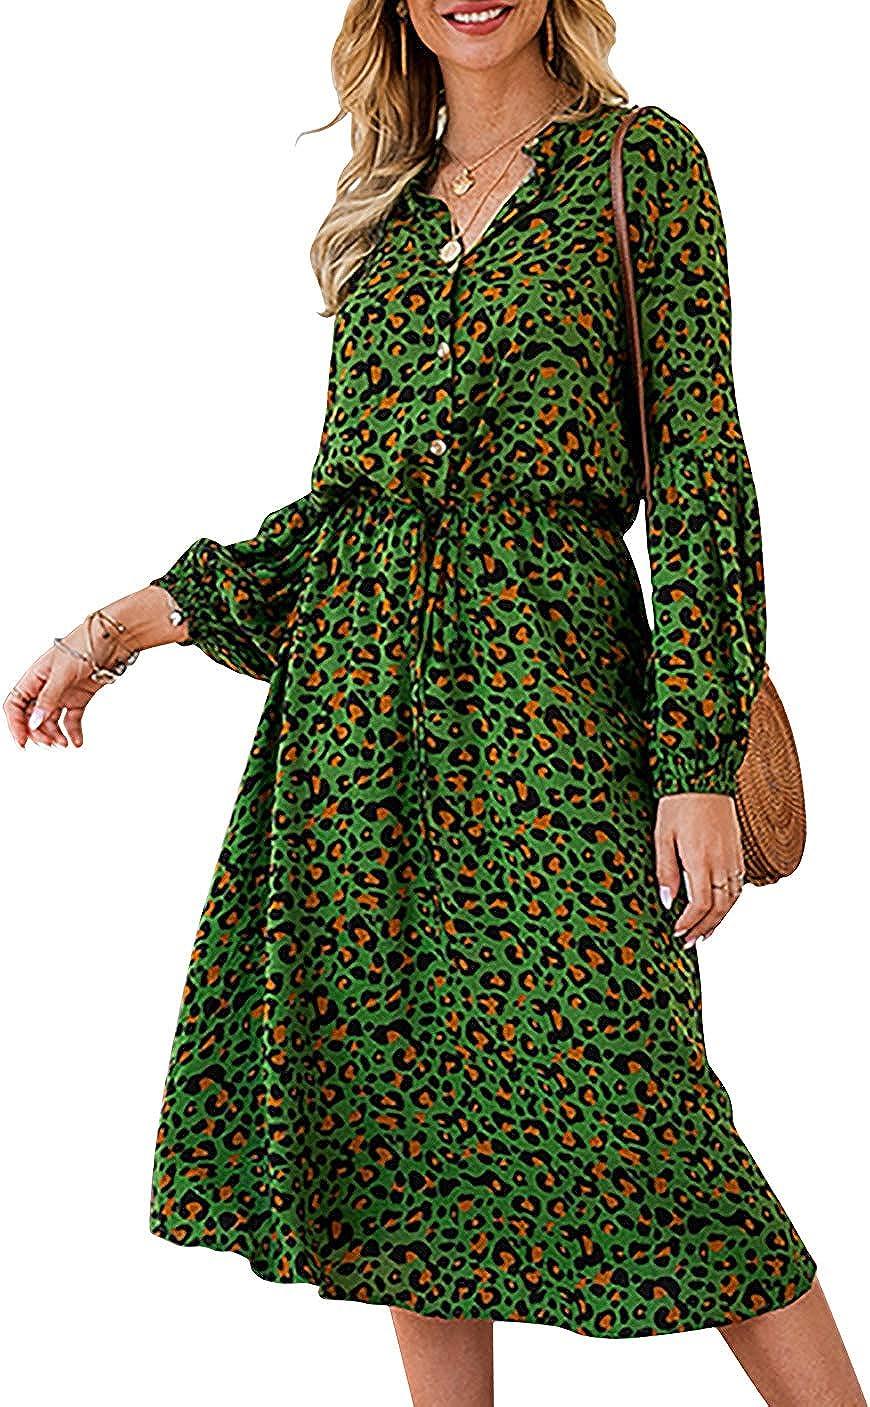 AmzBarley Women Midi Dresses Summer Floral Long Sleeve Casual Dress T Shirt Elegant Formal Work Ladies Dresses